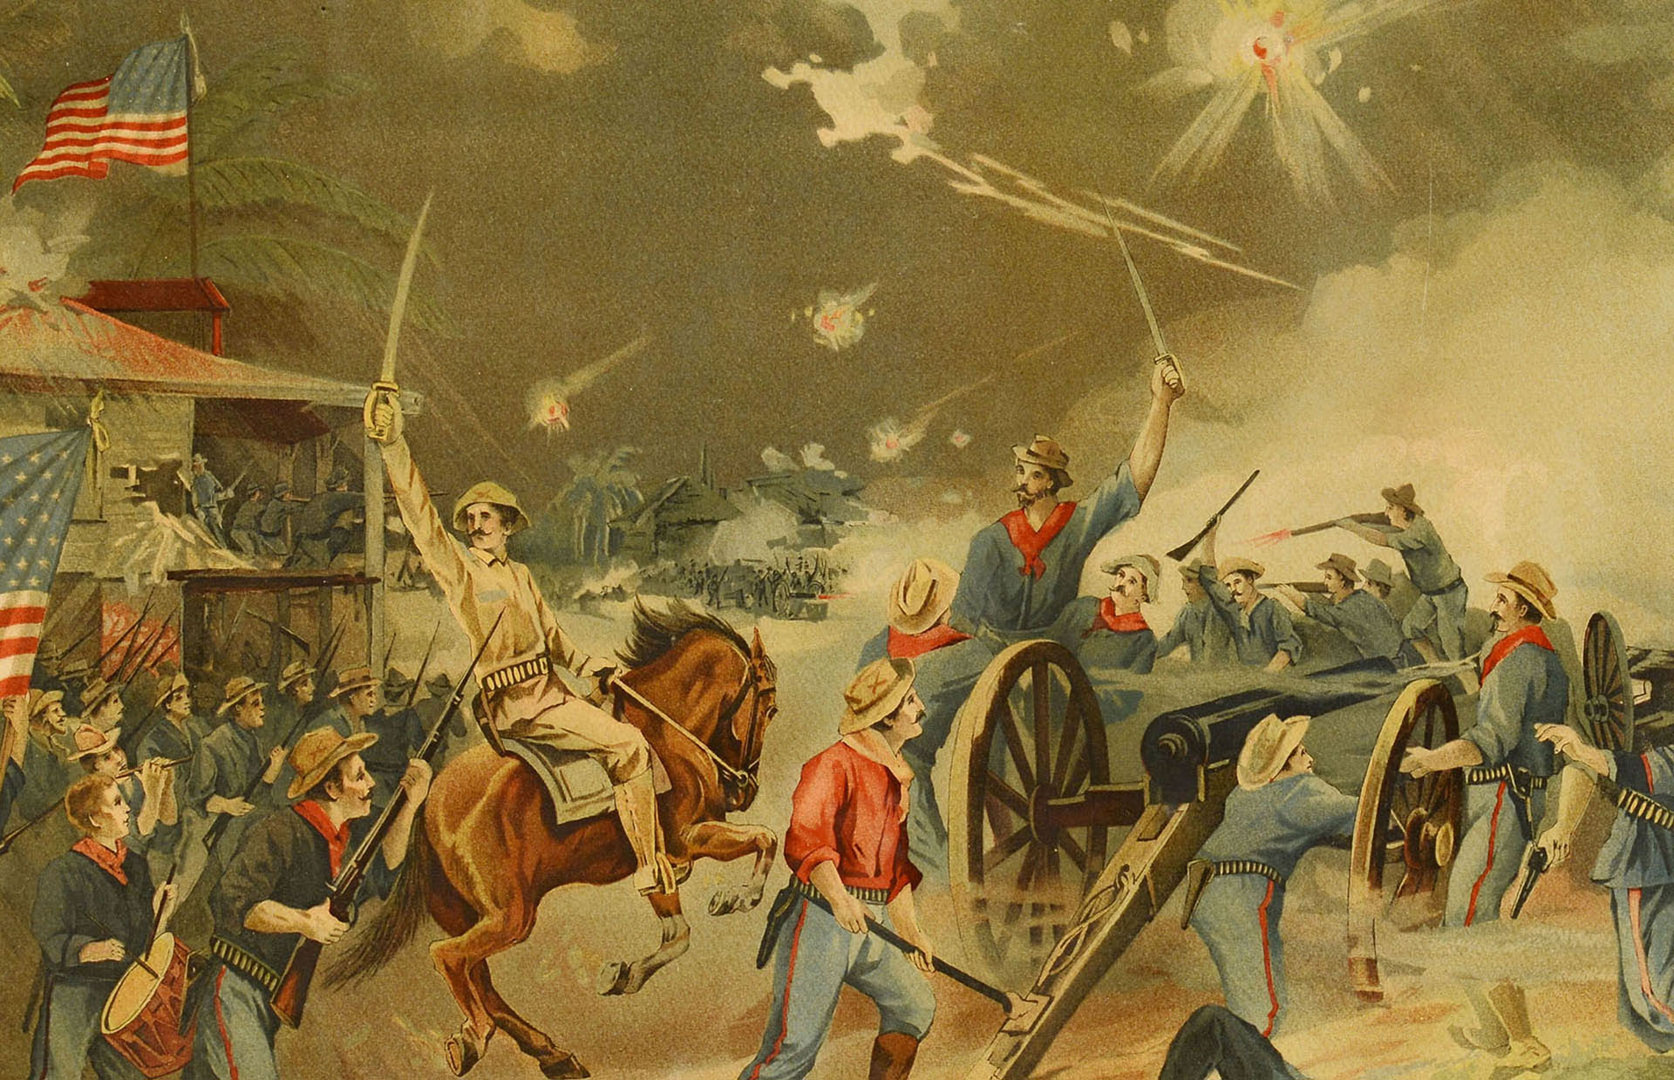 Lot 536: Spanish American War Lithograph